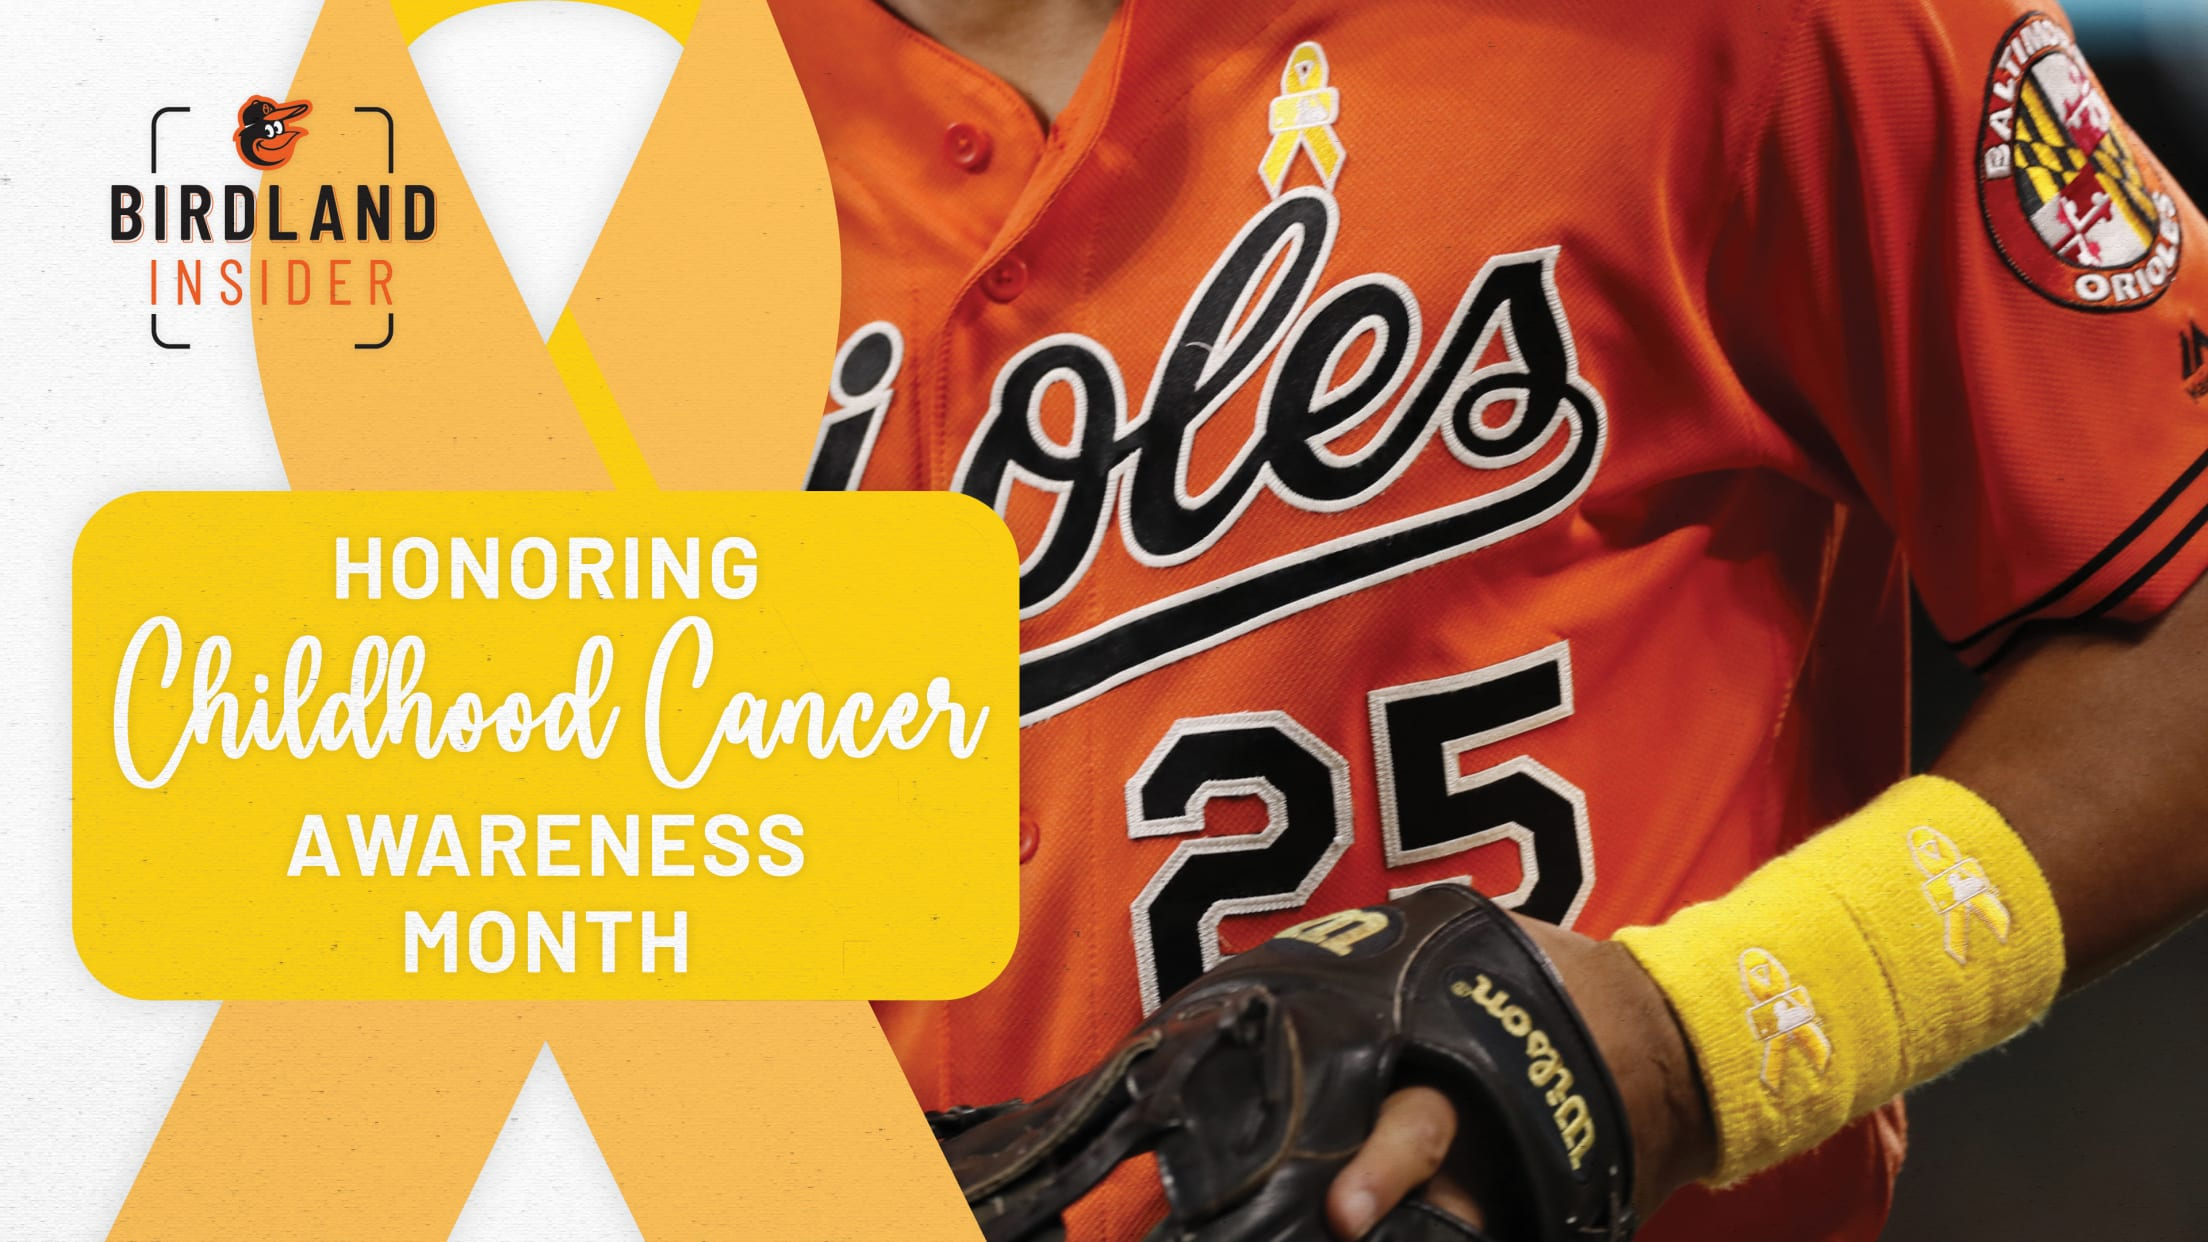 bal-honoring-childhood-cancer-awareness-month-header